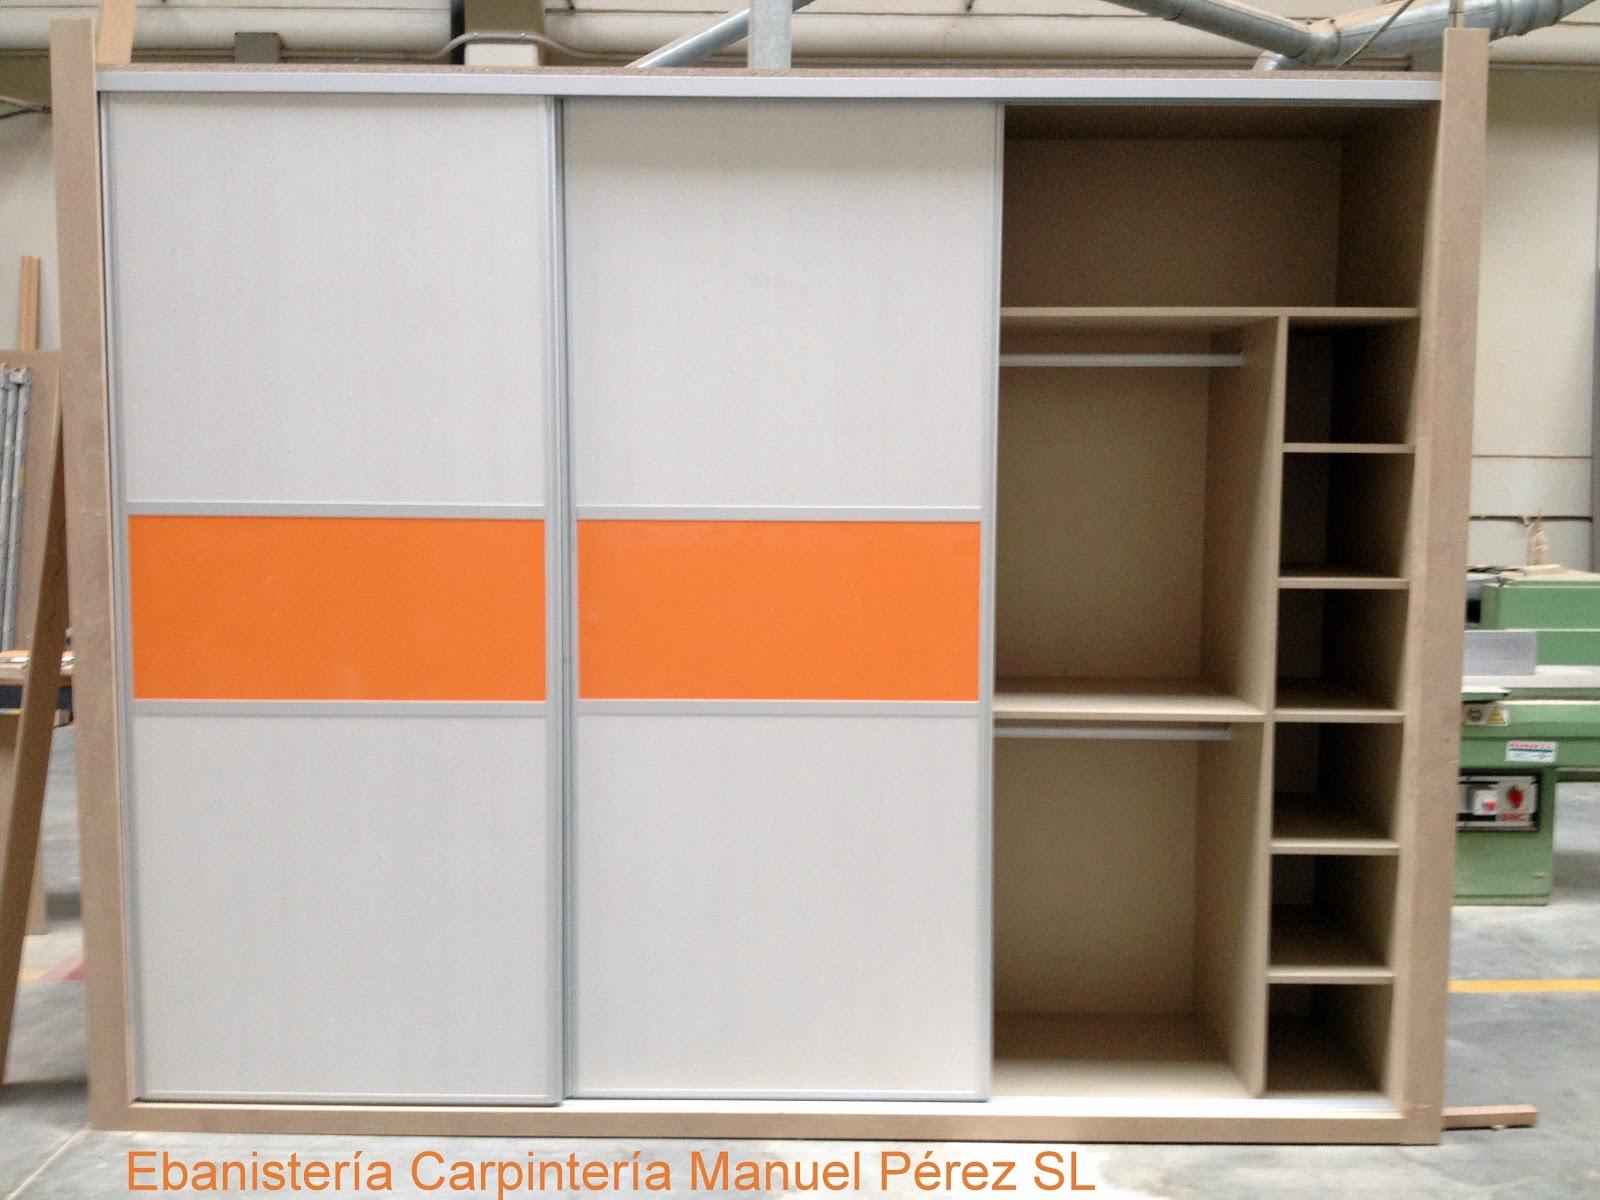 Ebanisteria carpinteria manuel perez zaragoza armario - Medidas puerta corredera ...